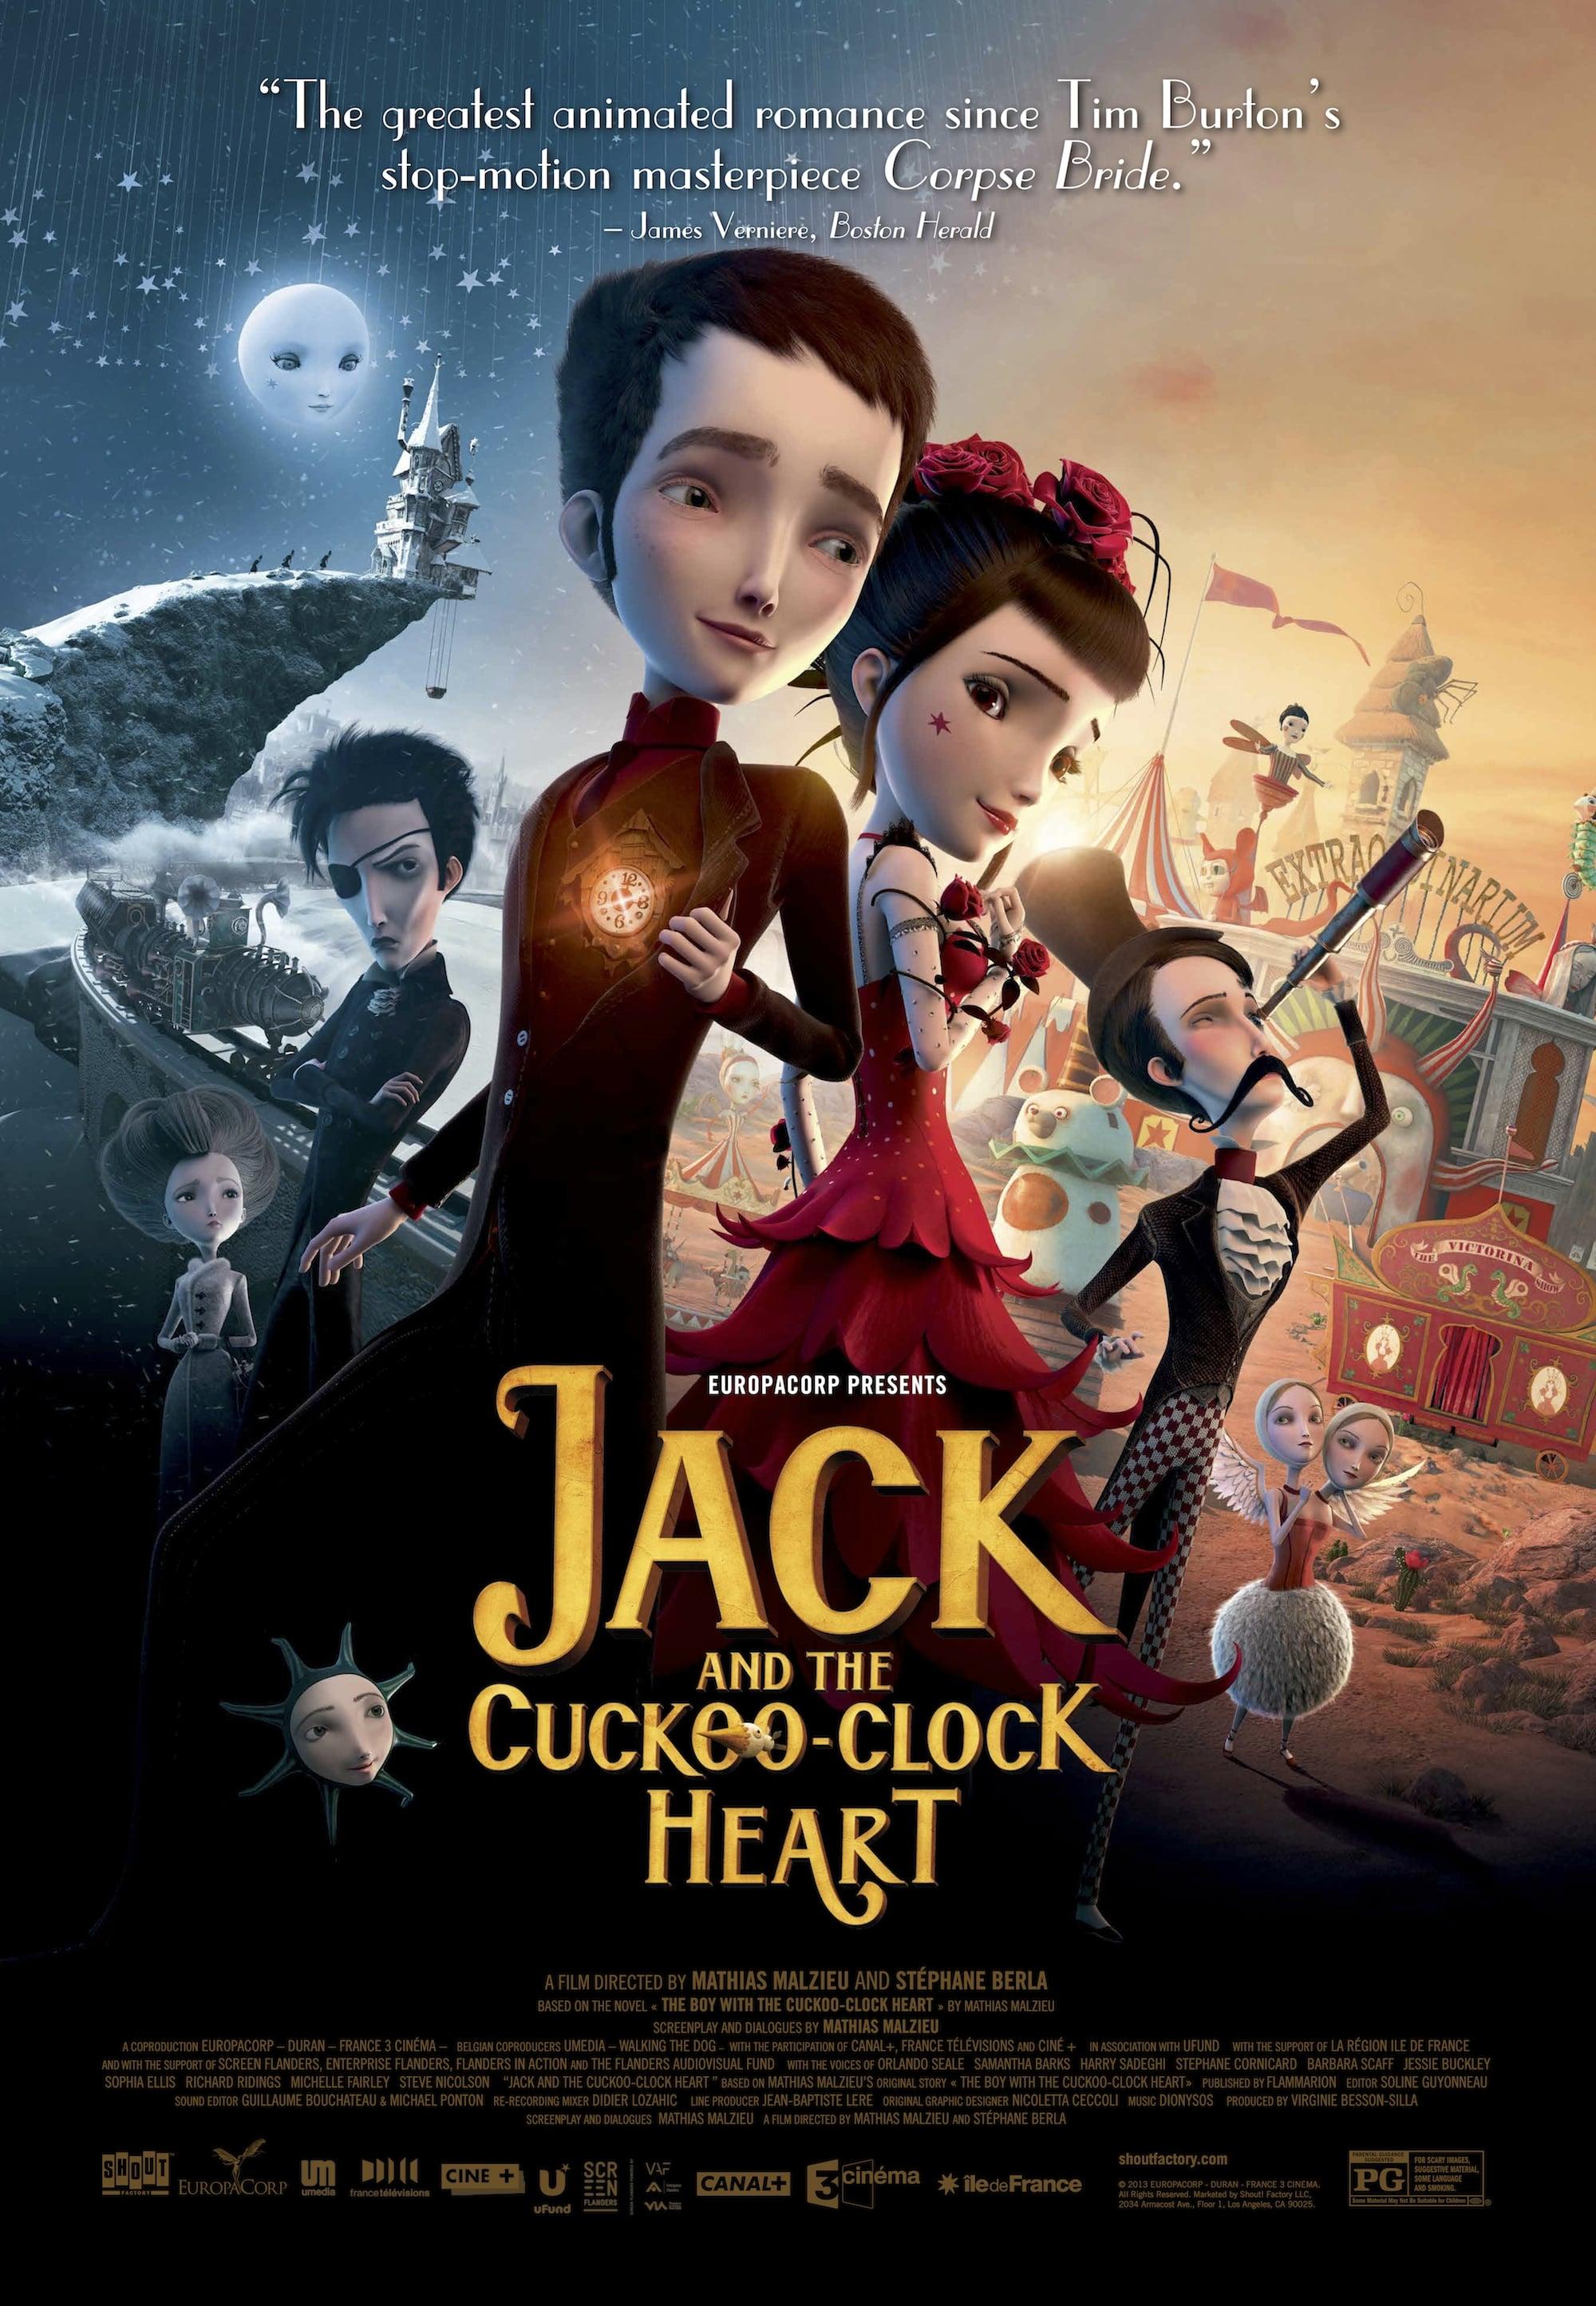 Jack and the Cuckoo-Clock Heart (2014)